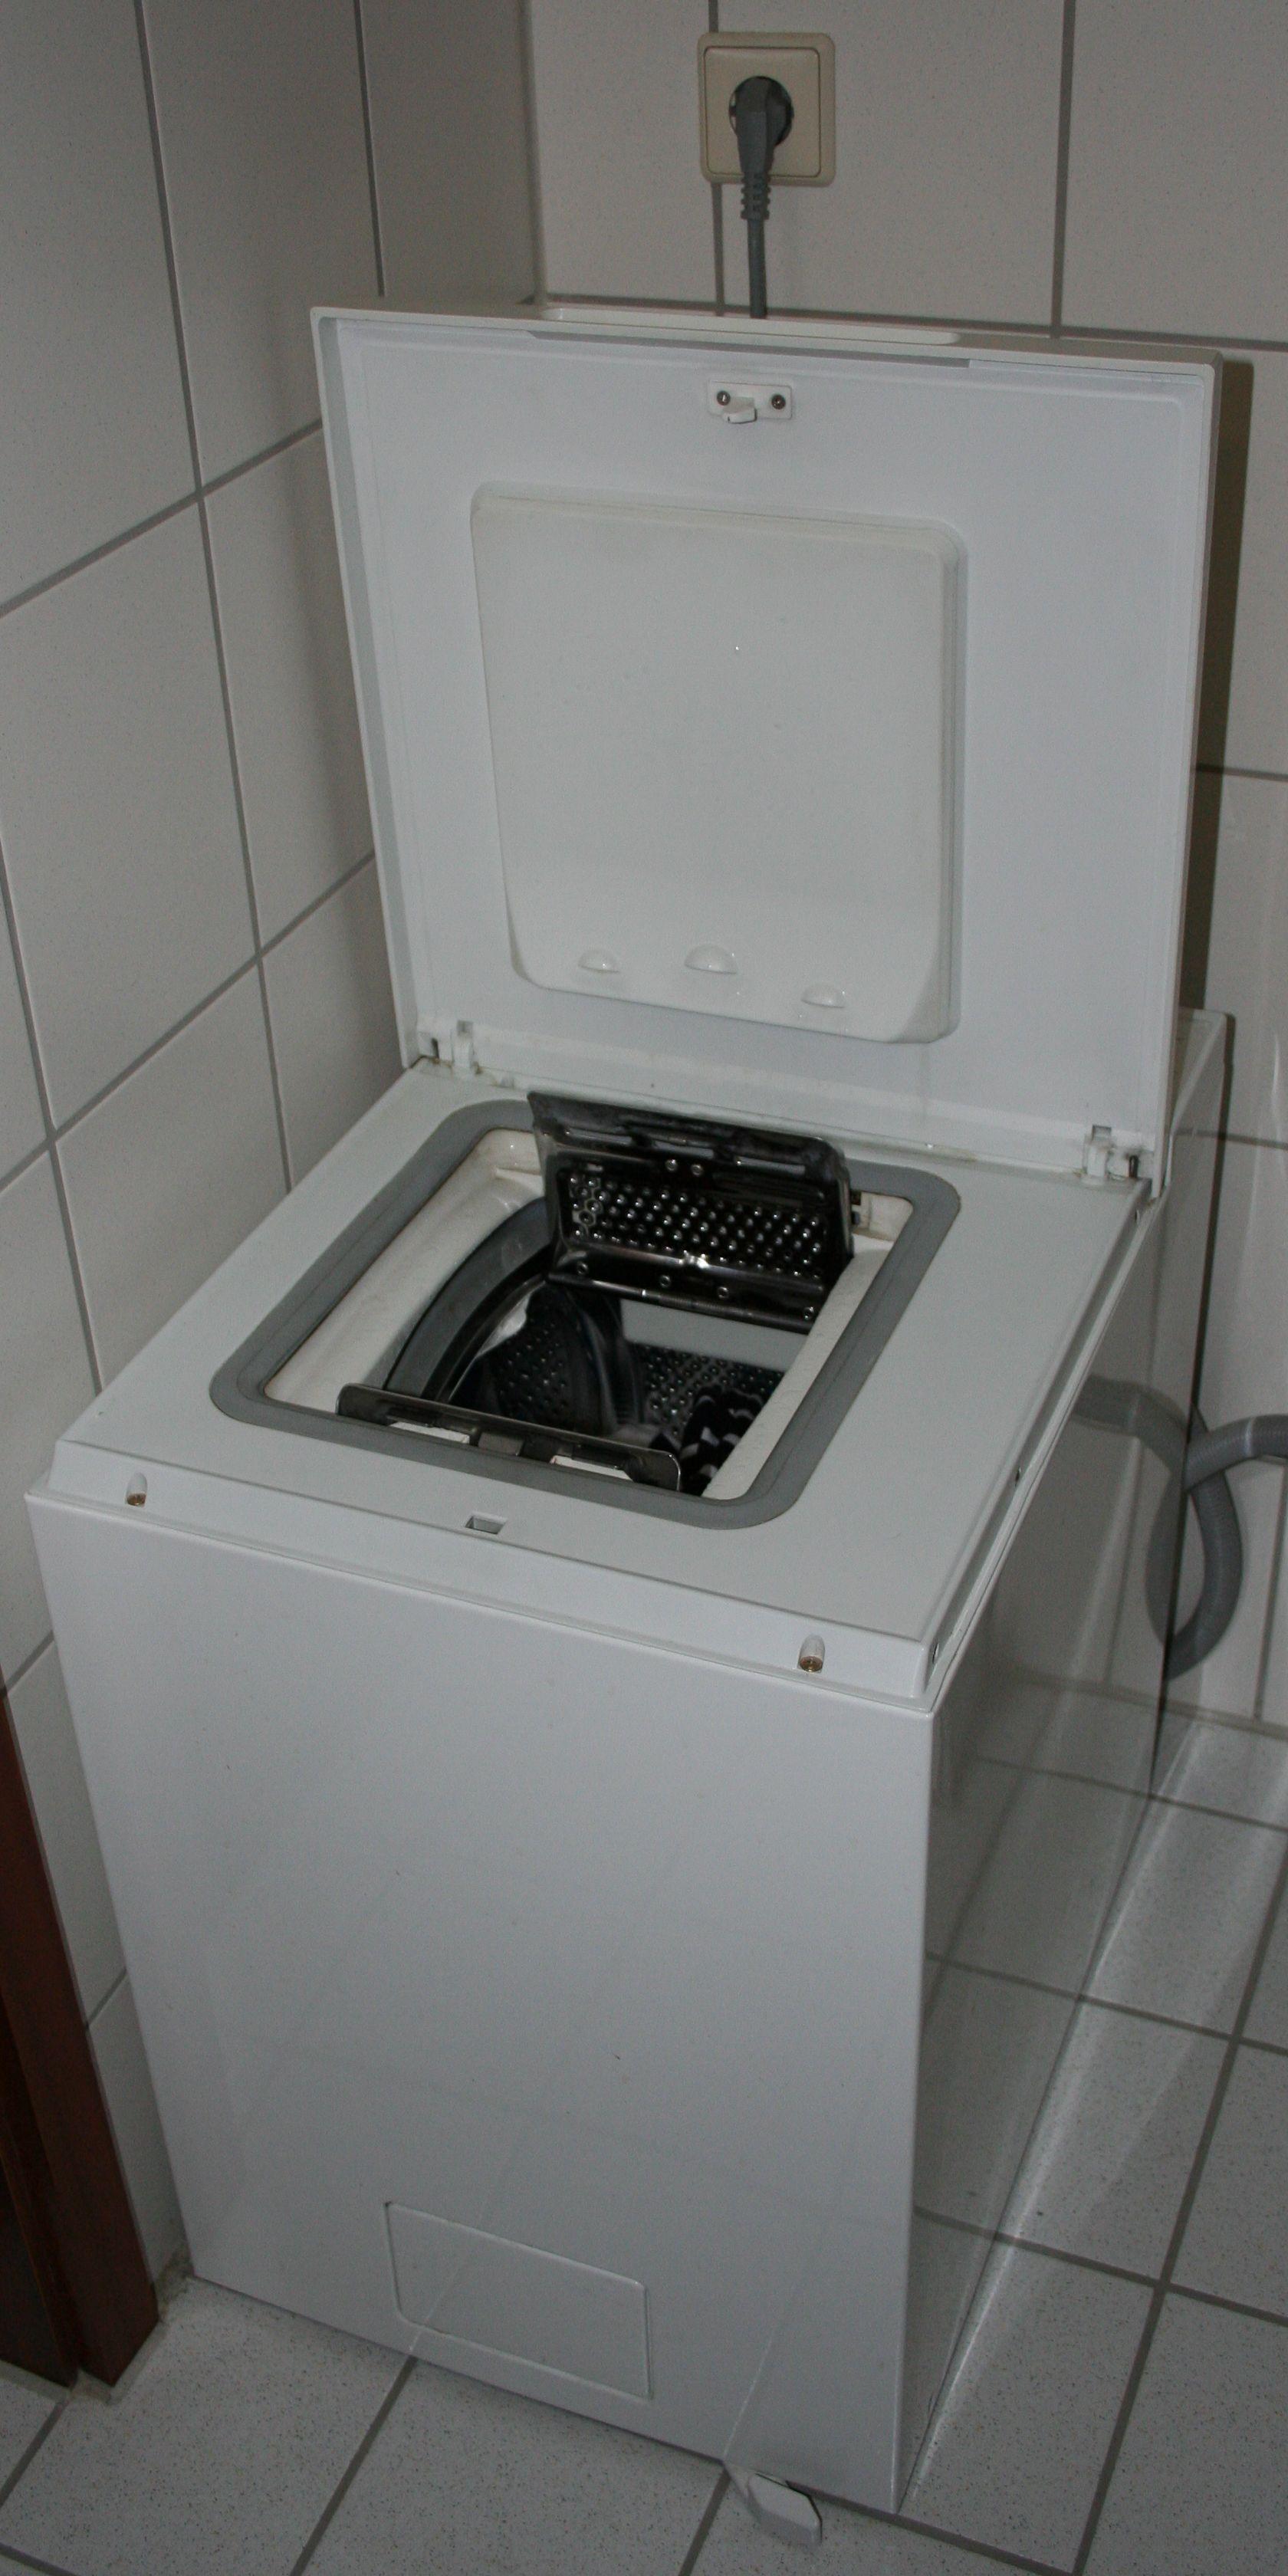 Waschmaschine – Wikipedia